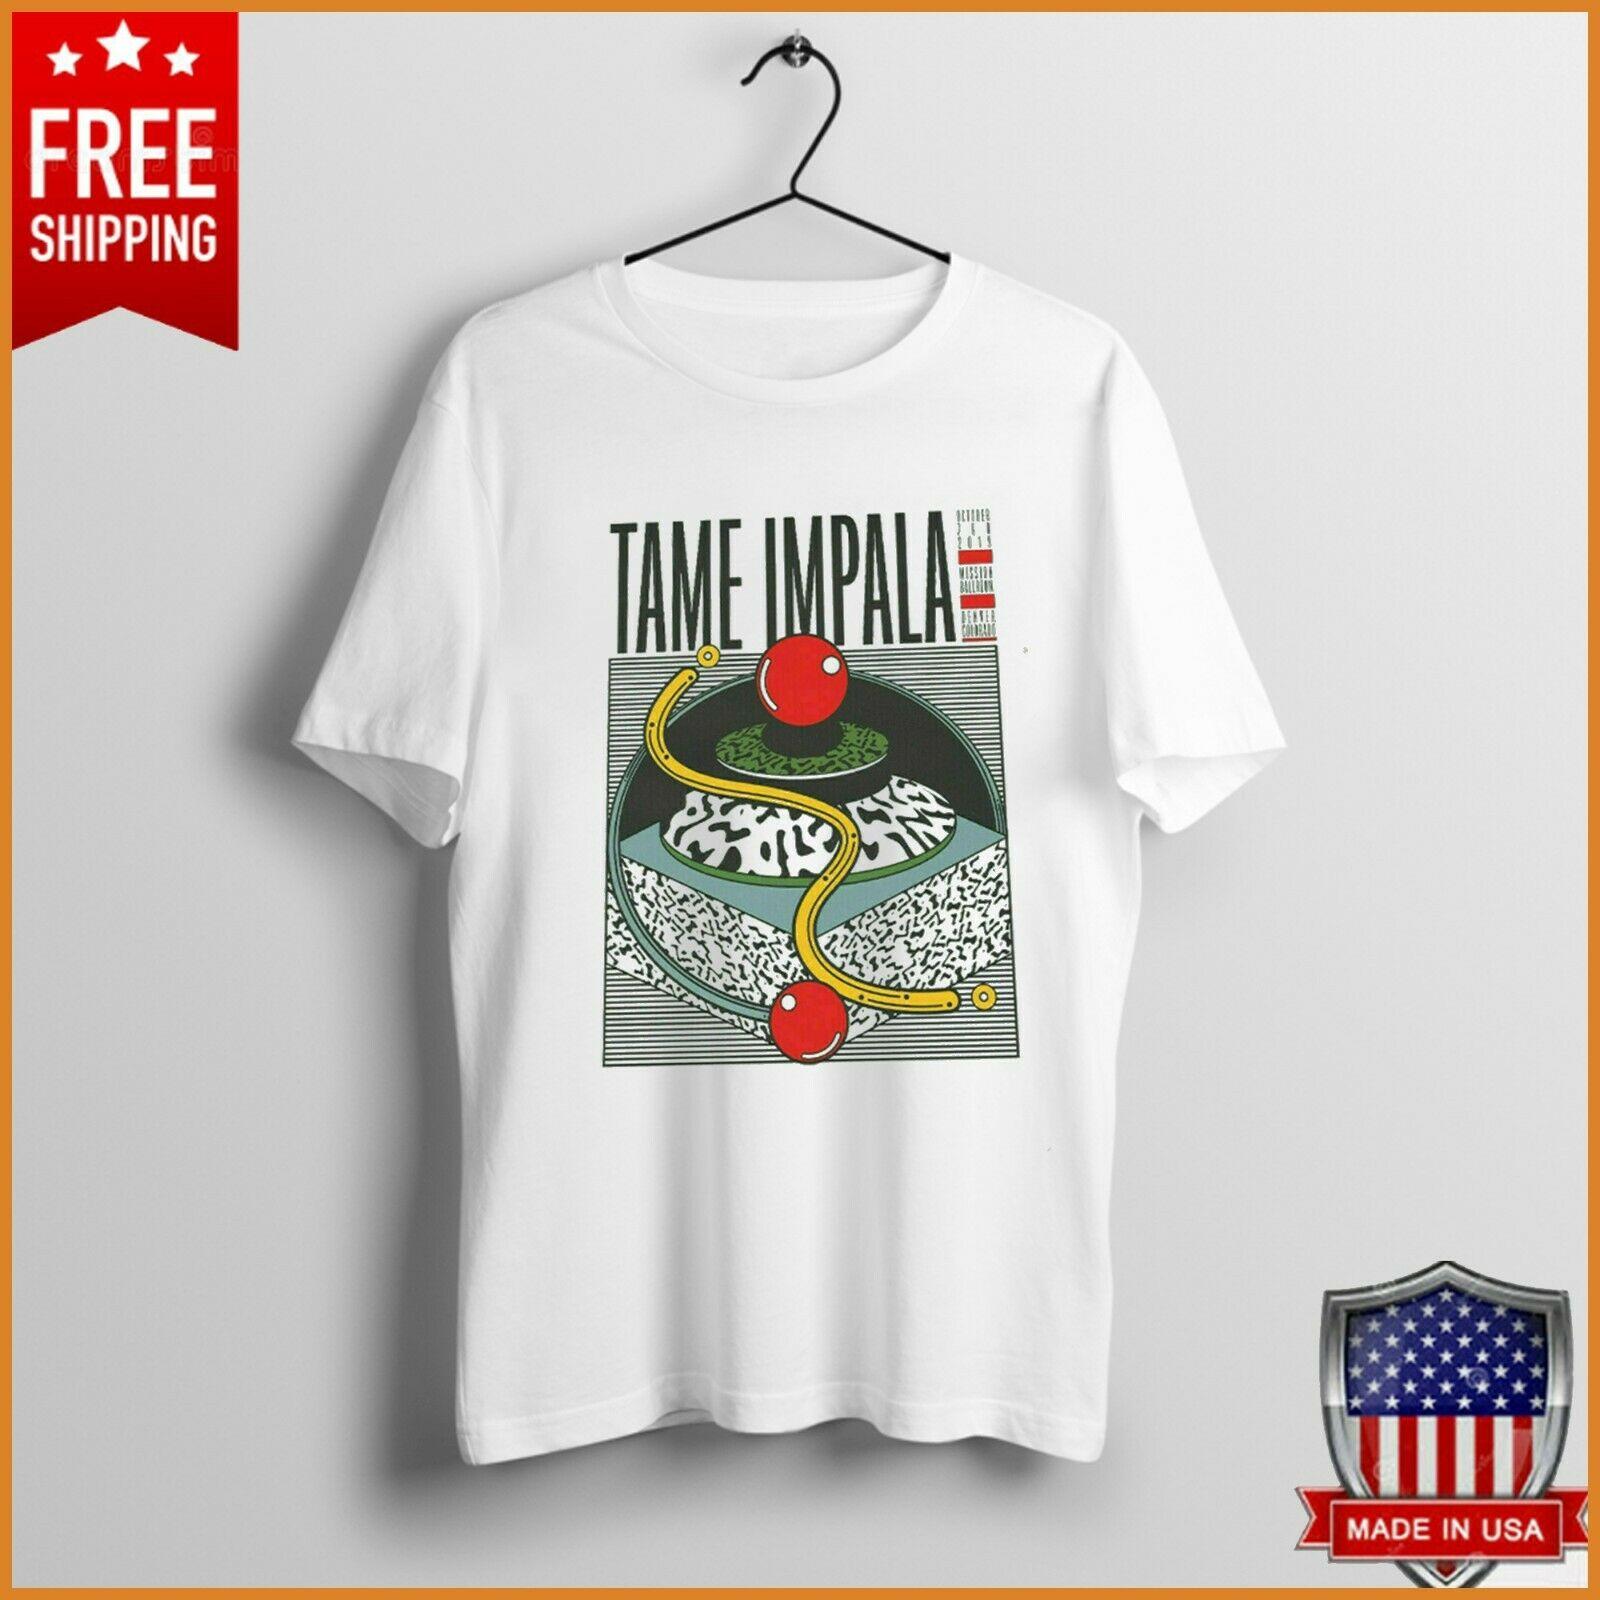 Takashi Murakami Complexcon MCA The Octopus Eats Its Own Leg T-Shirt Tee SZ XL